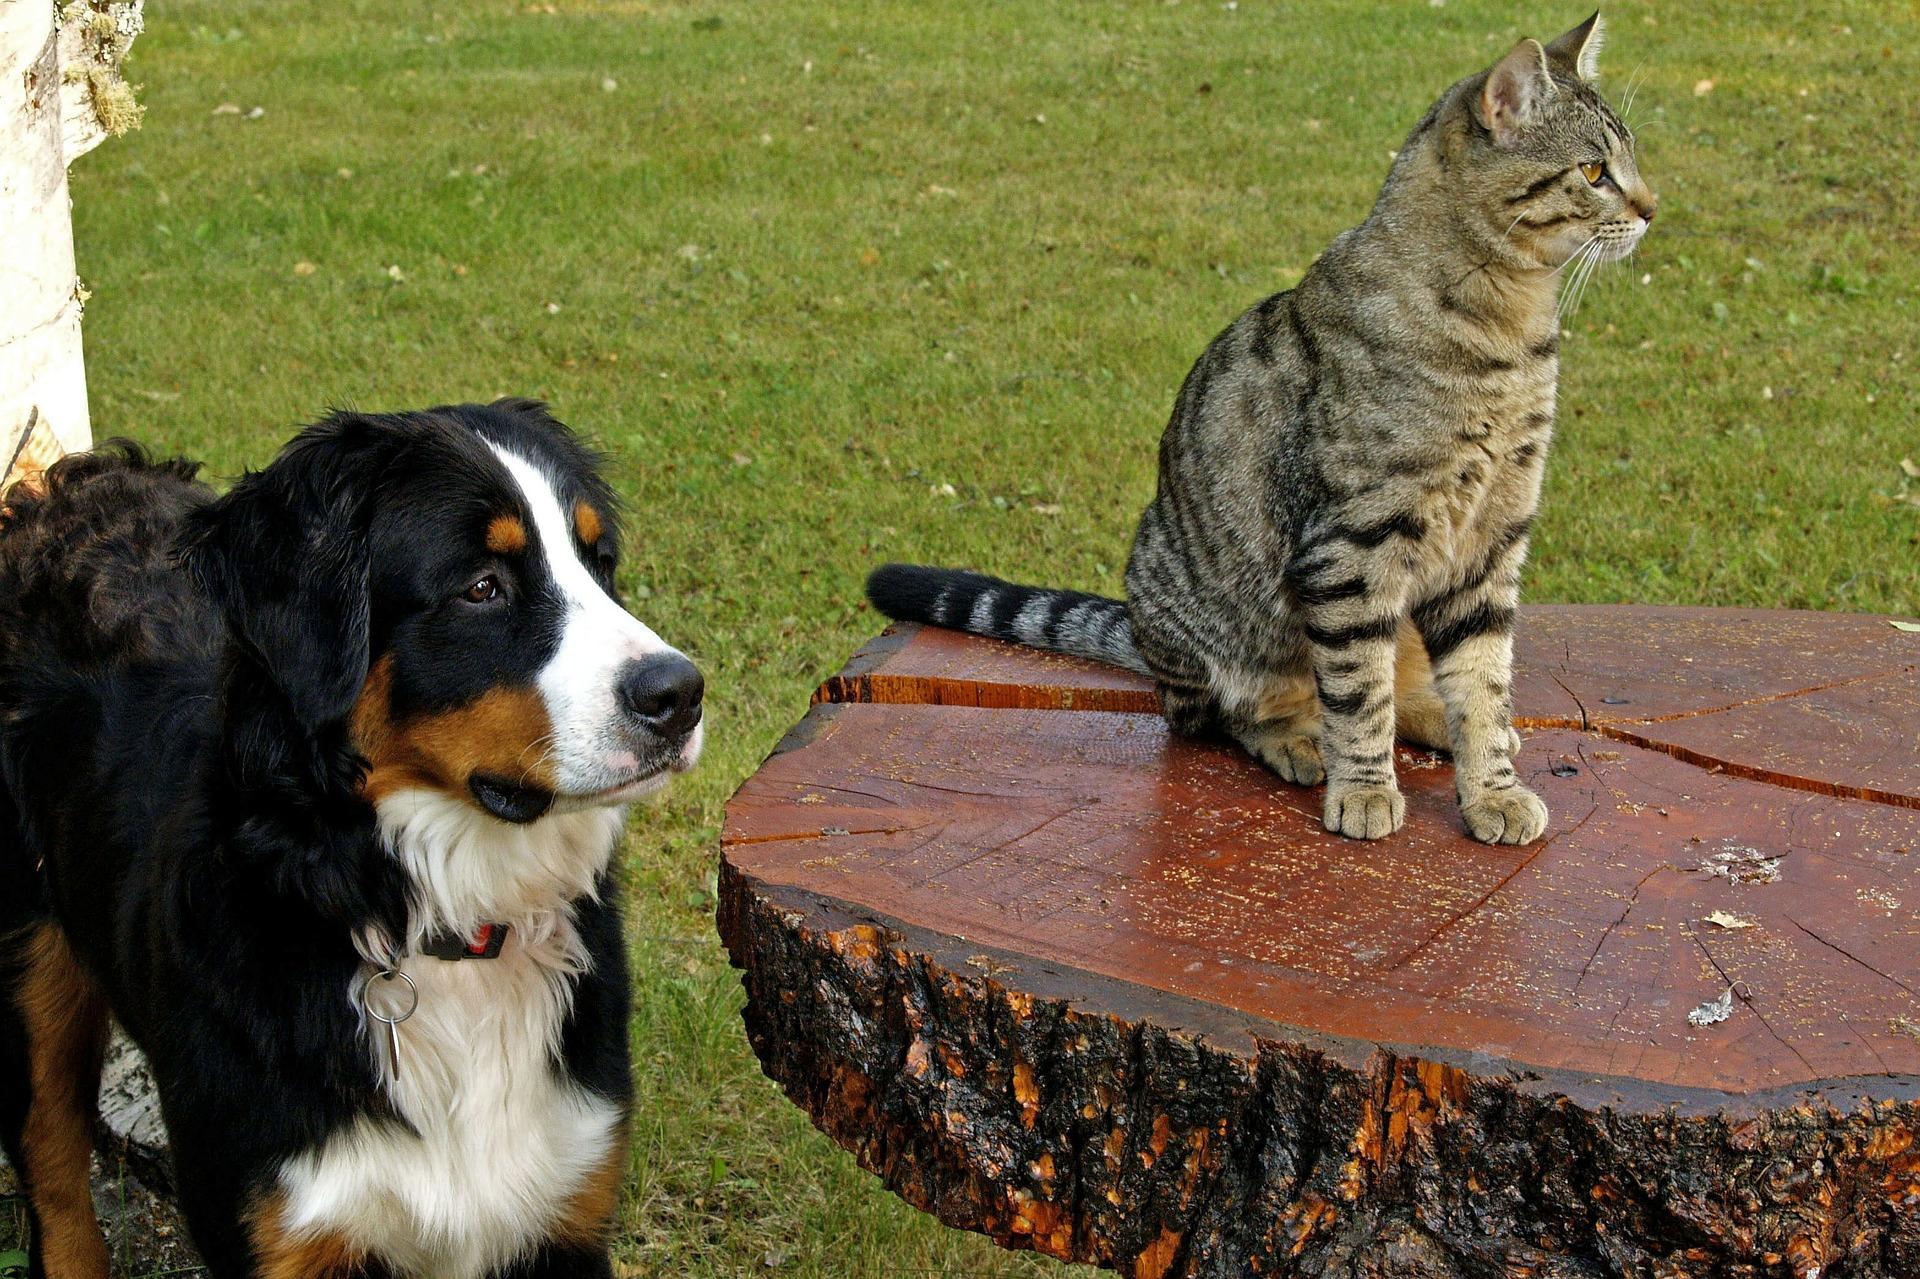 animale de companie - caine - pisica - sfatulparintilor.ro - pixabay_com